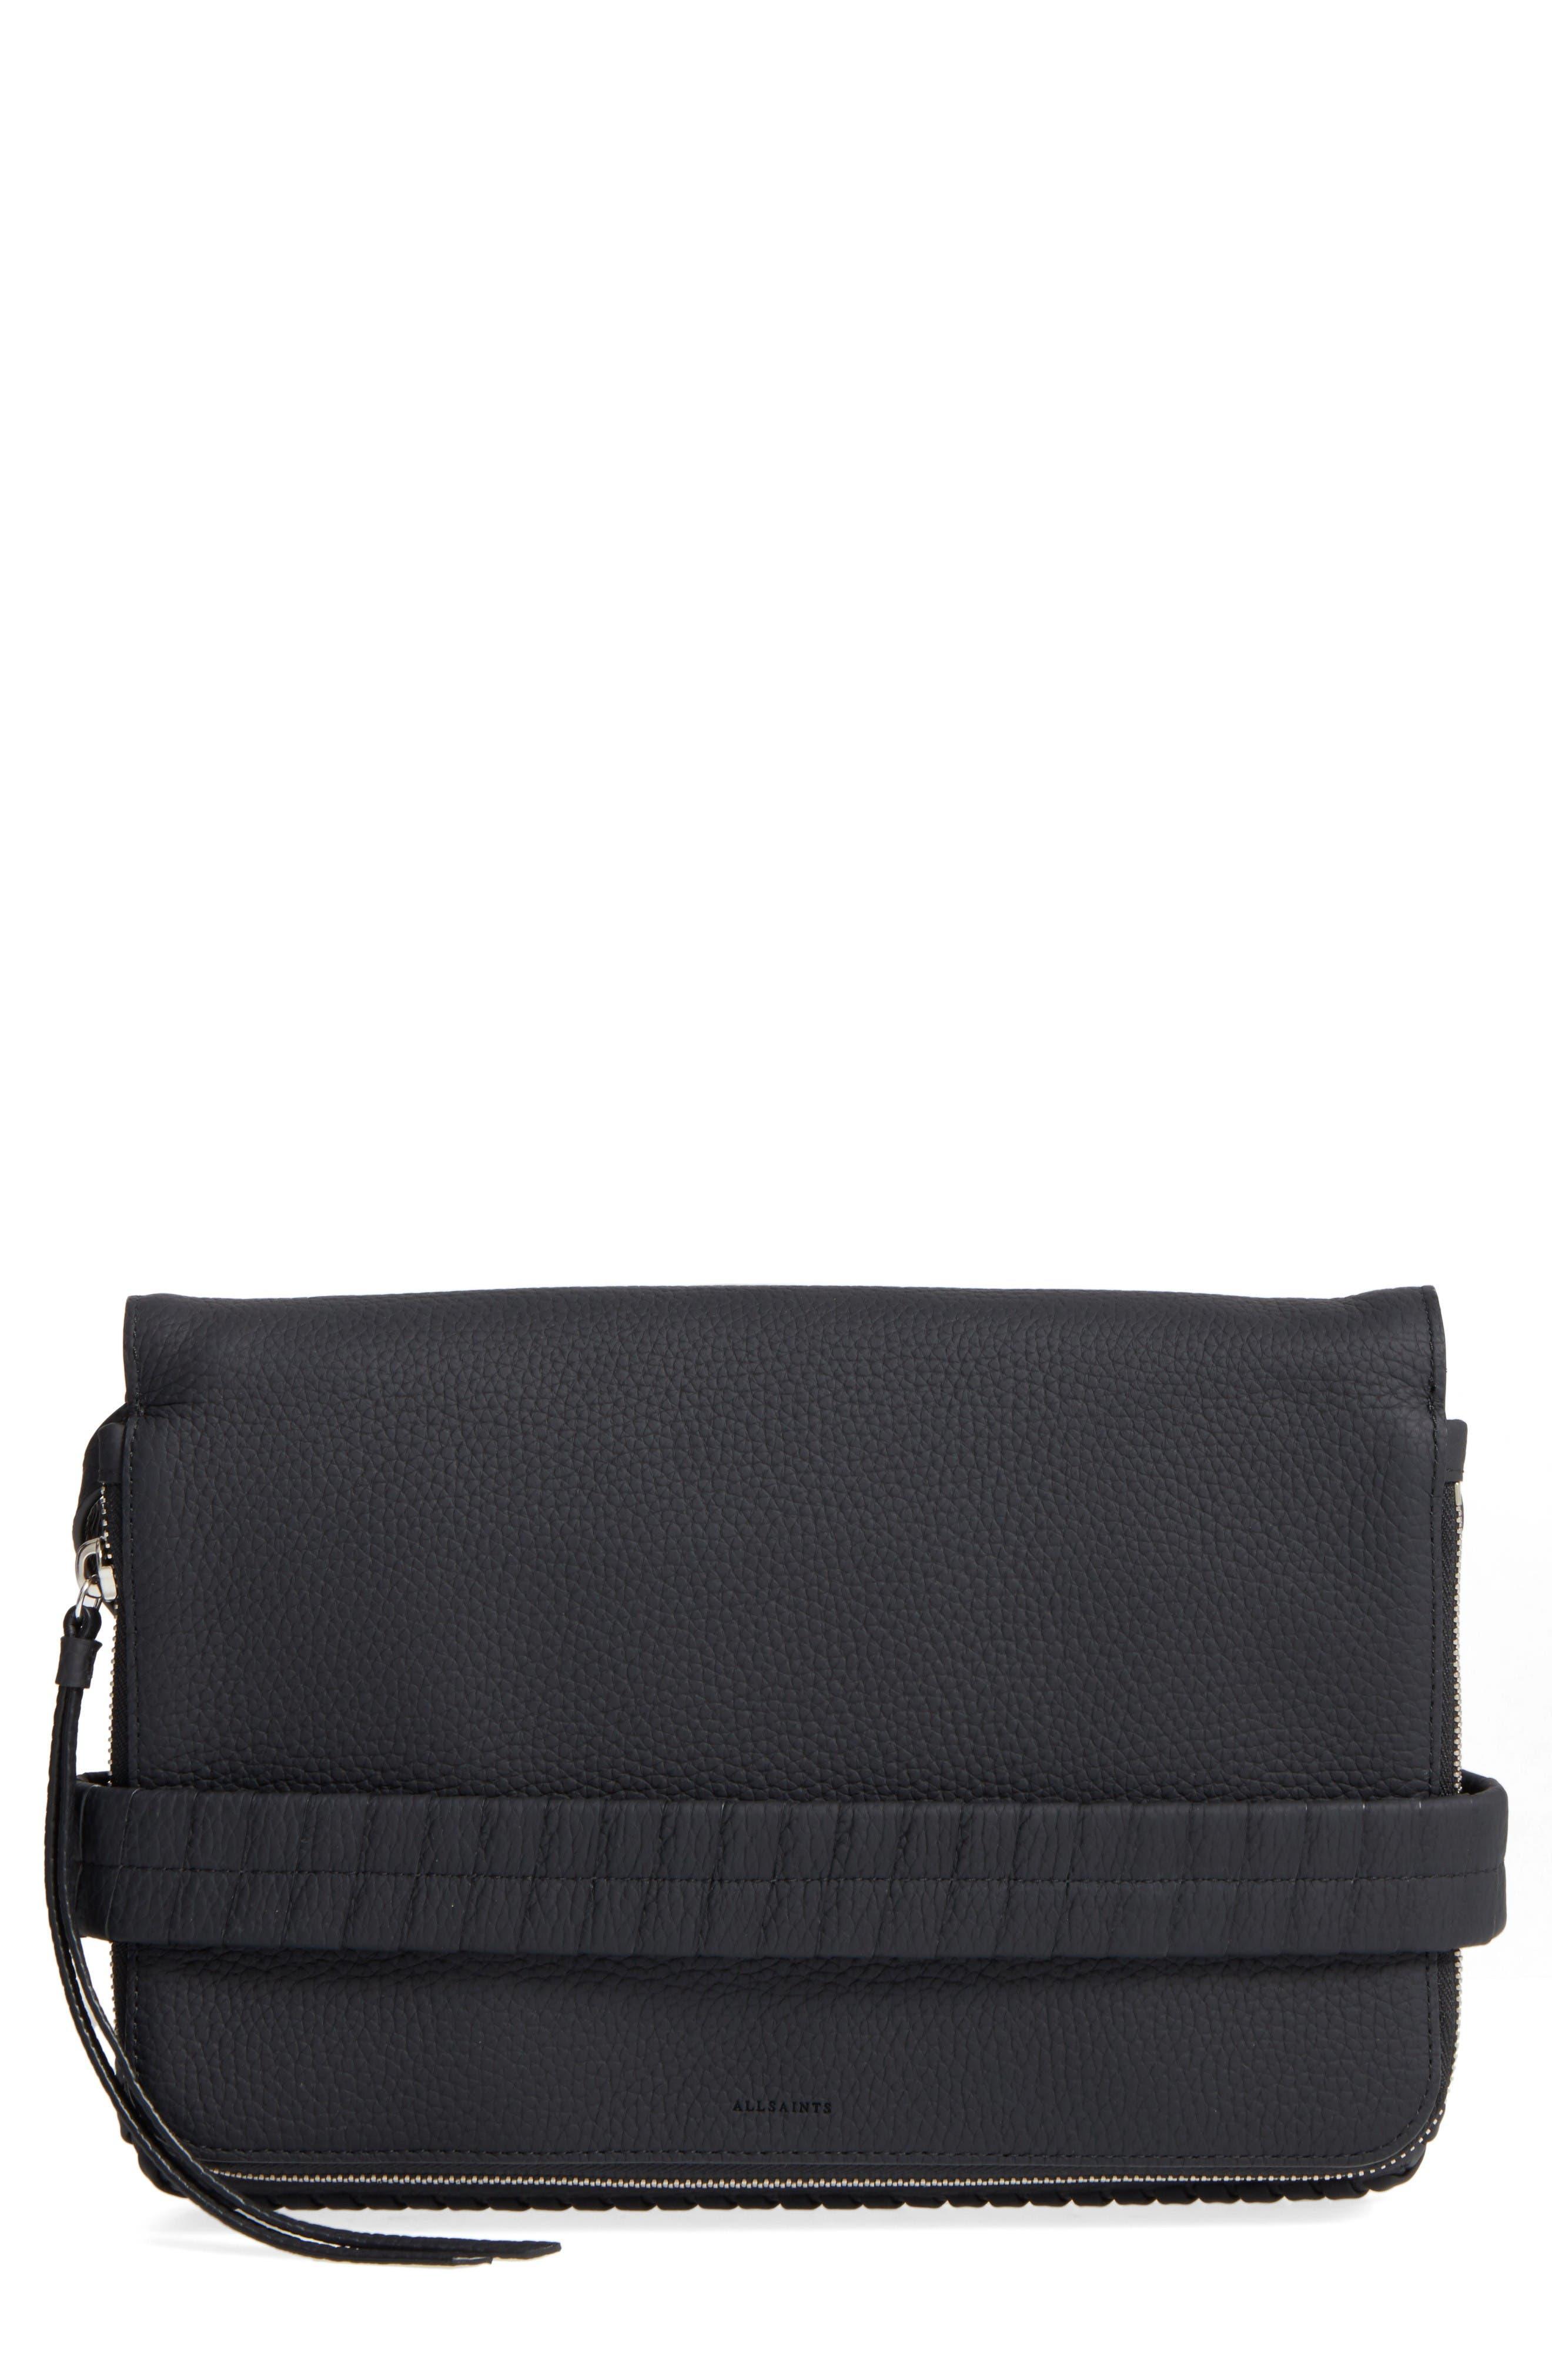 Alternate Image 1 Selected - ALLSAINTS Medium Club Convertible Crossbody Bag